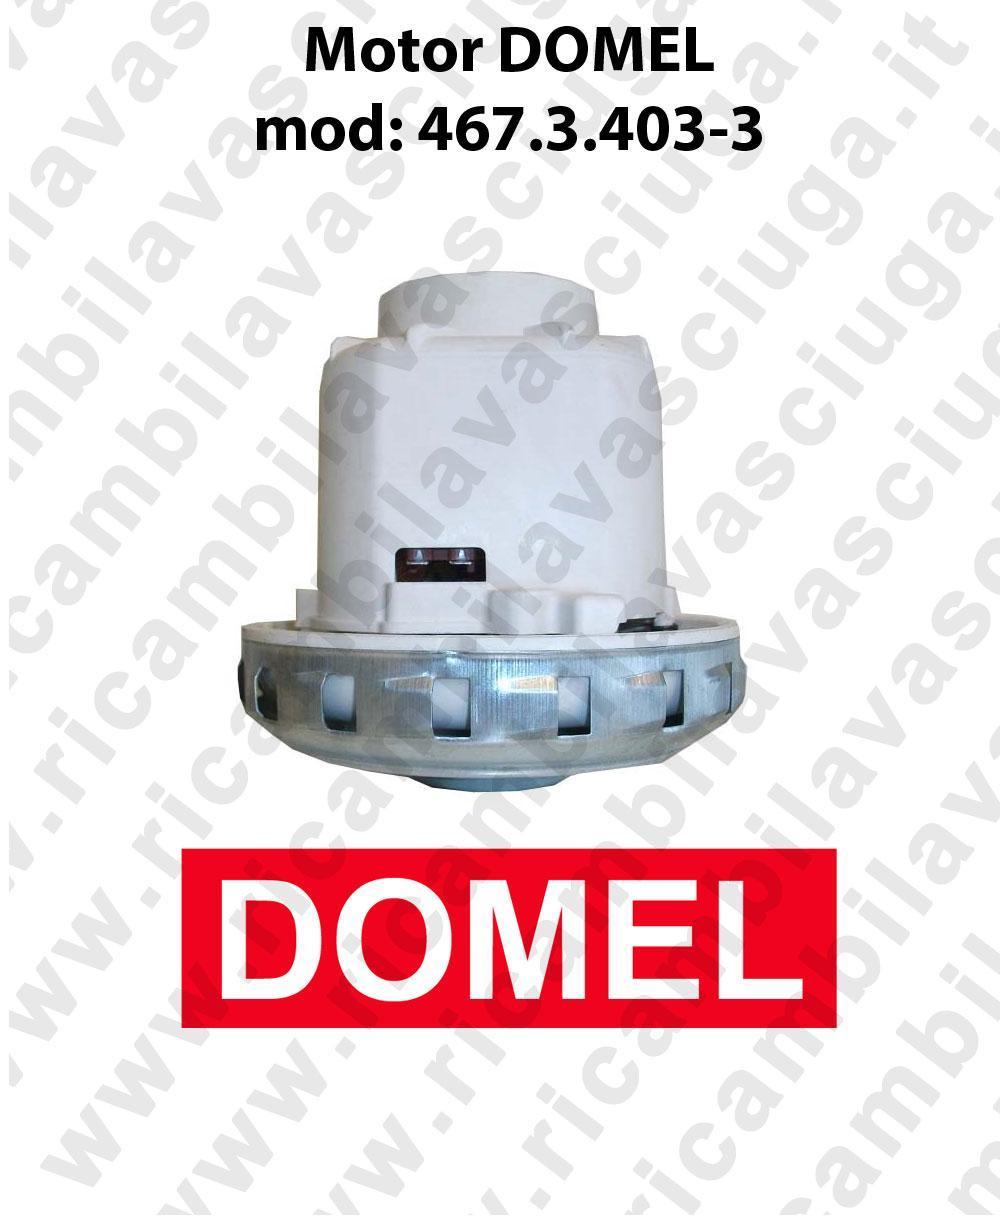 DOMEL 467.3.403-3 Vacuum motor for scrubber dryer e vacuum cleaner